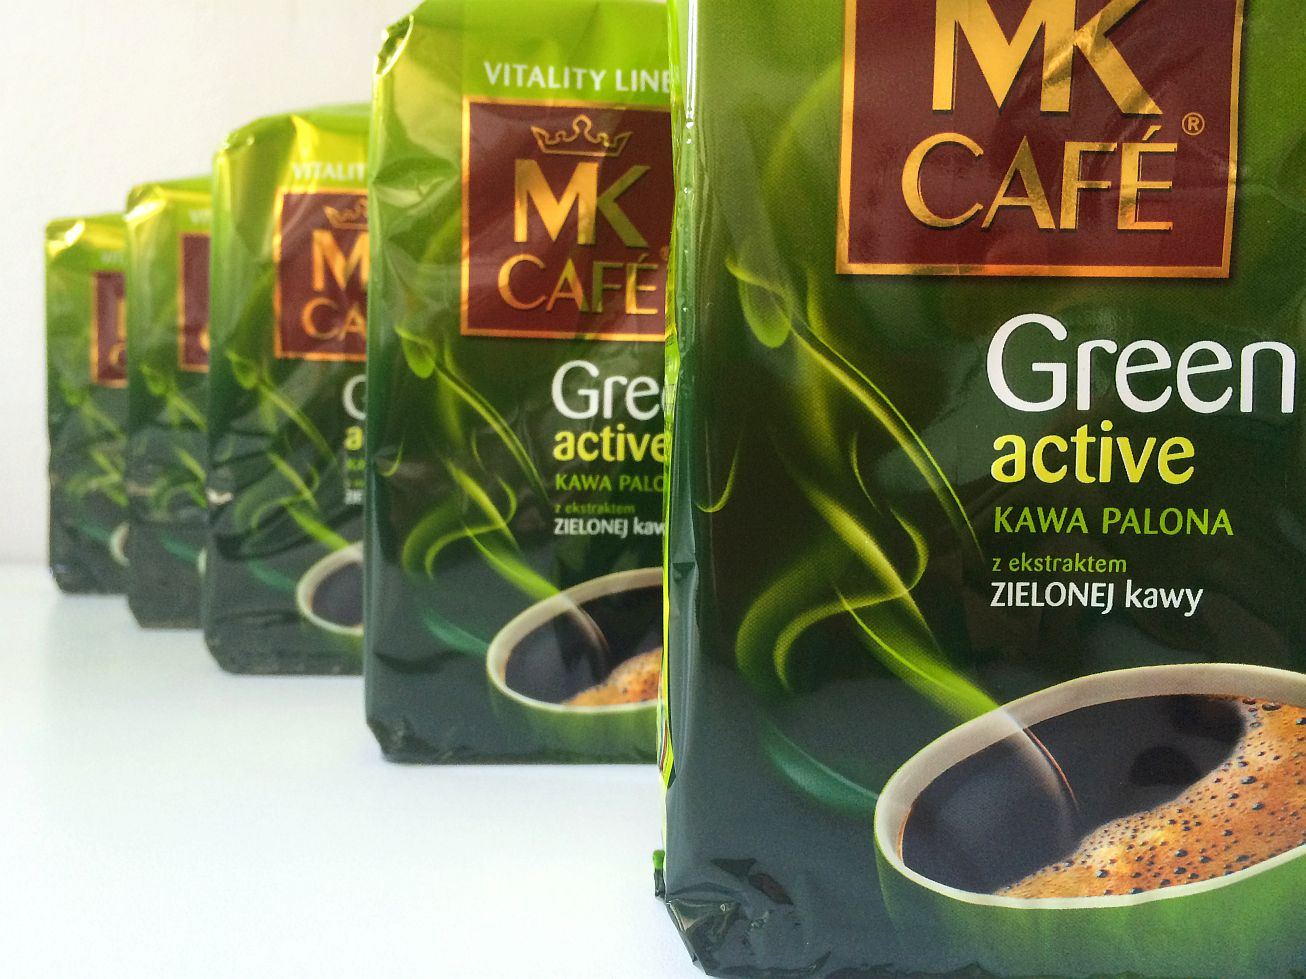 nowa-kawa-dla-aktywnych-malvina-pe-2